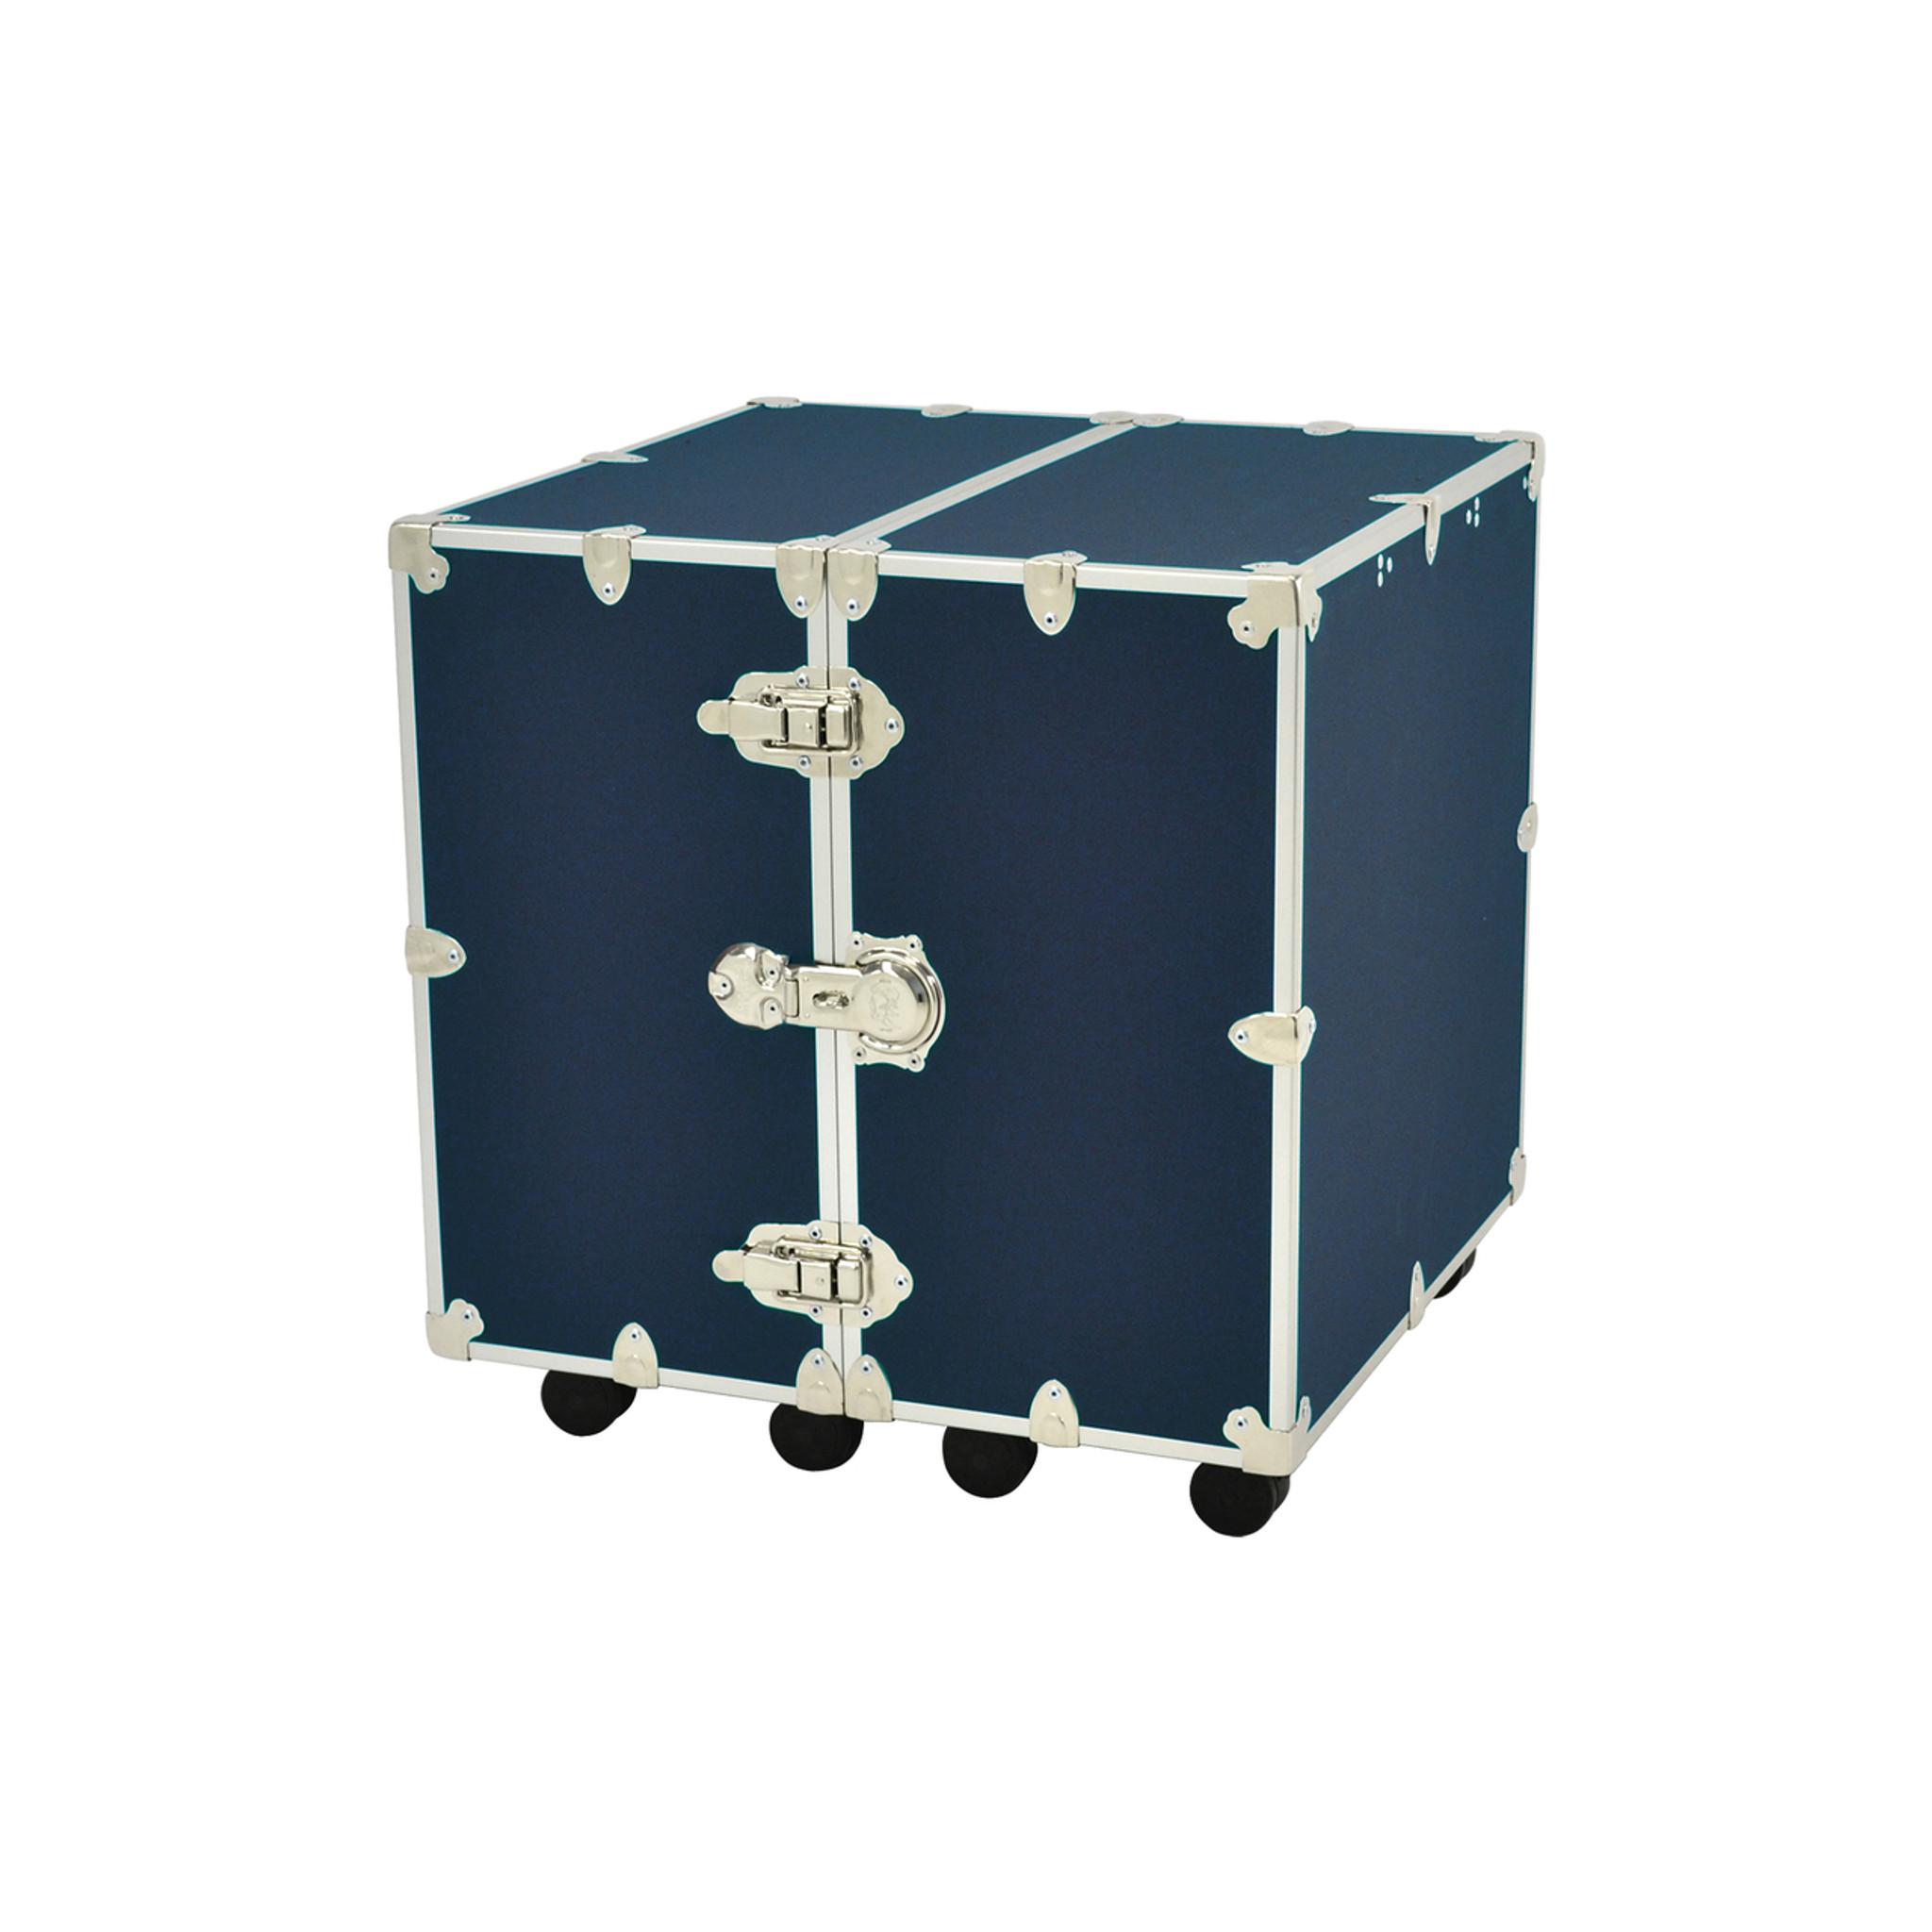 medium rhino urban wardrobe trunk in navy blue - Wardrobe Trunk